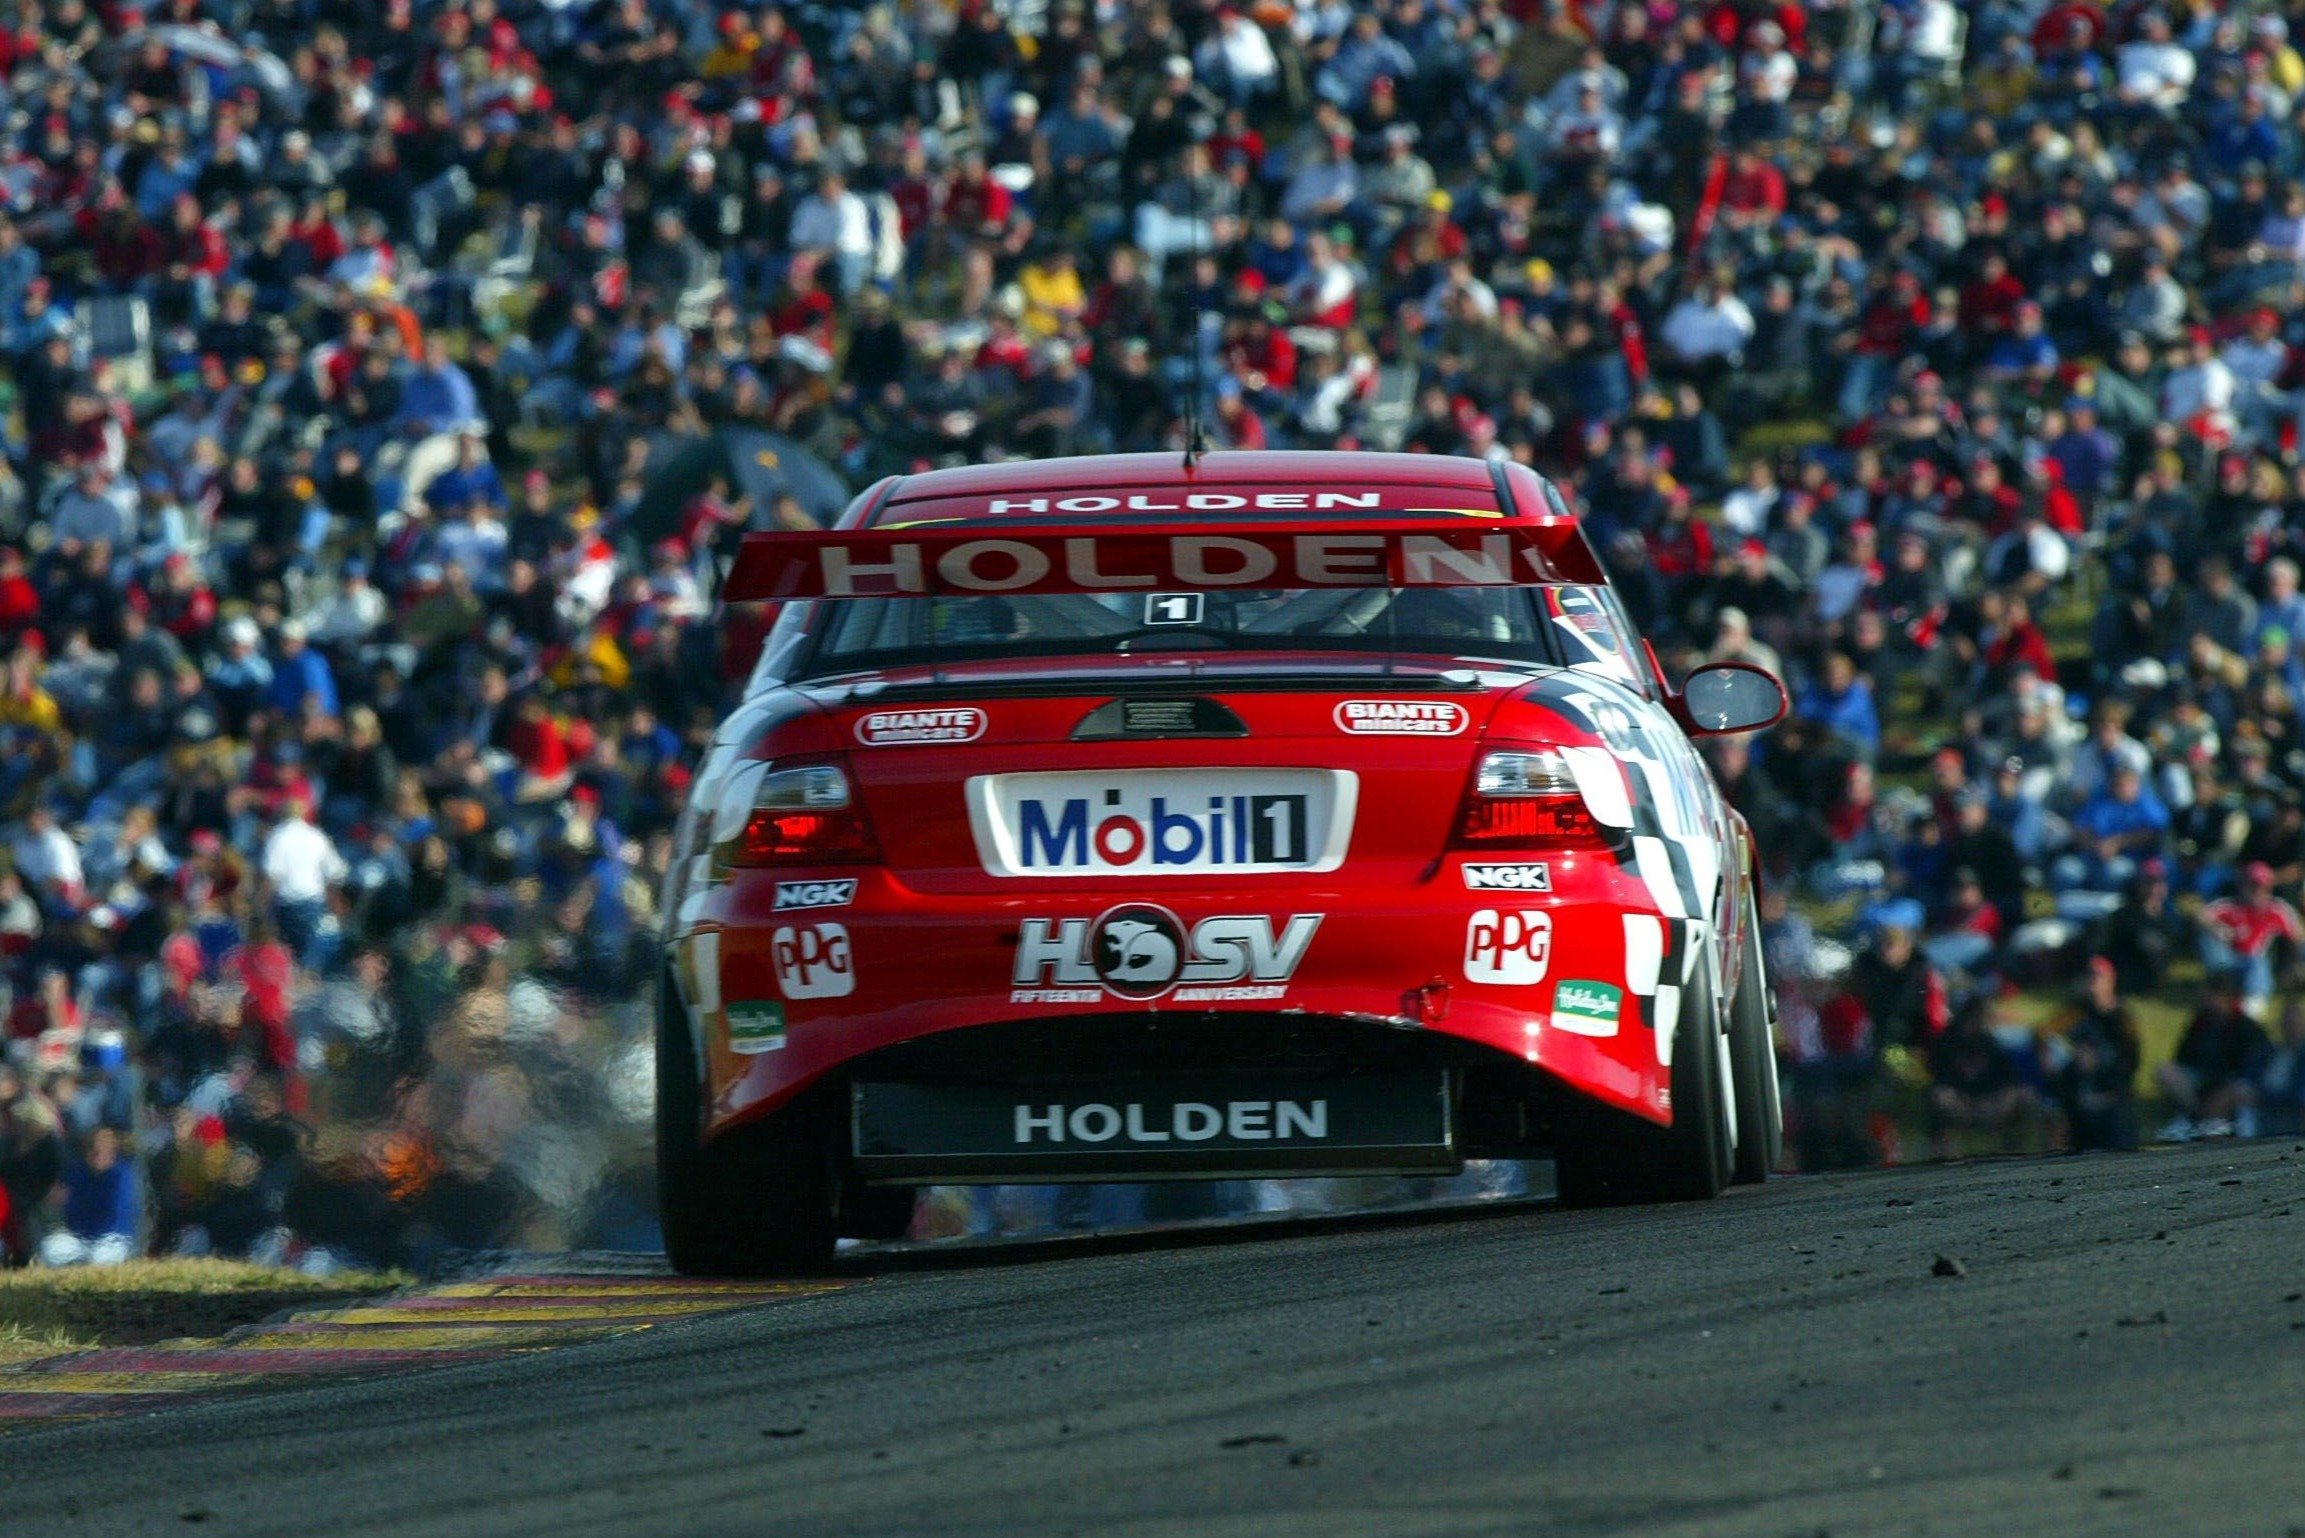 Mark Skaife, Holden Racing Team, Oran Park 2002